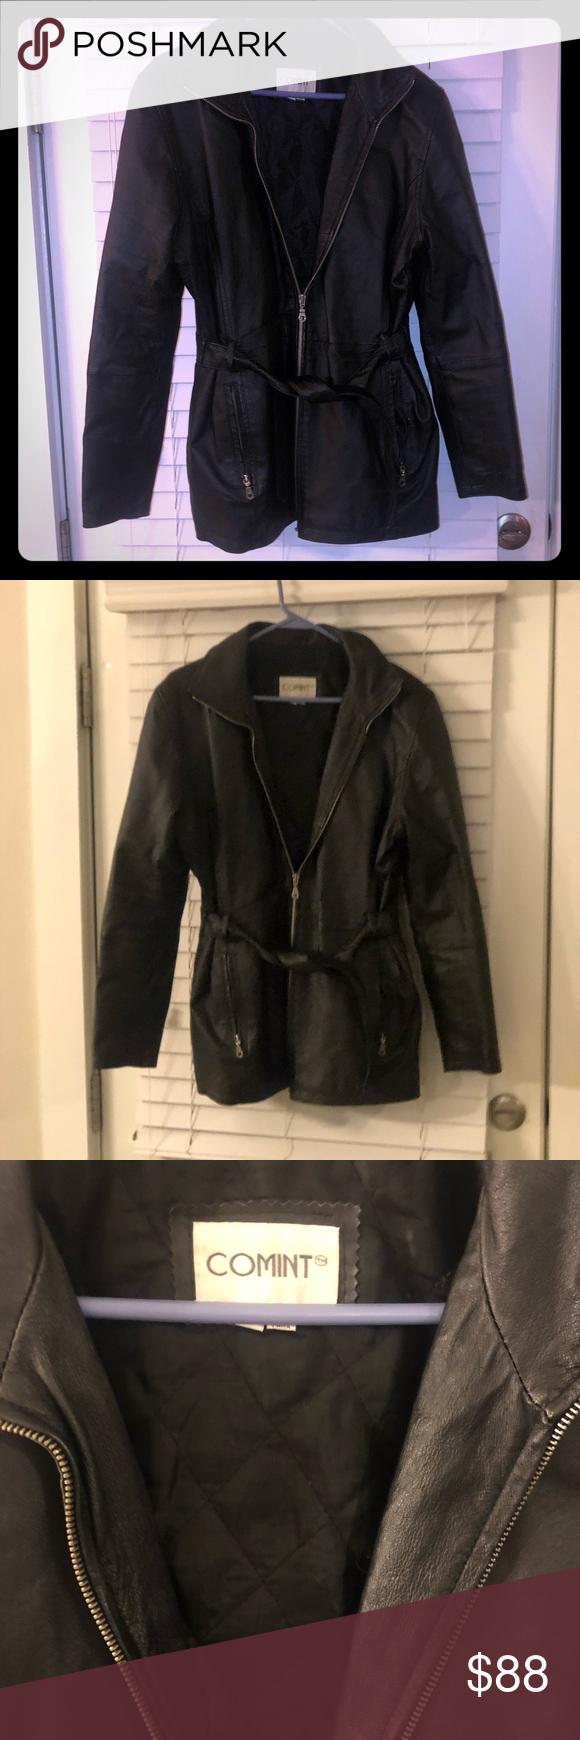 Comint Black Leather Jacket Leather Jacket Black Leather Jacket Jackets [ 1740 x 580 Pixel ]